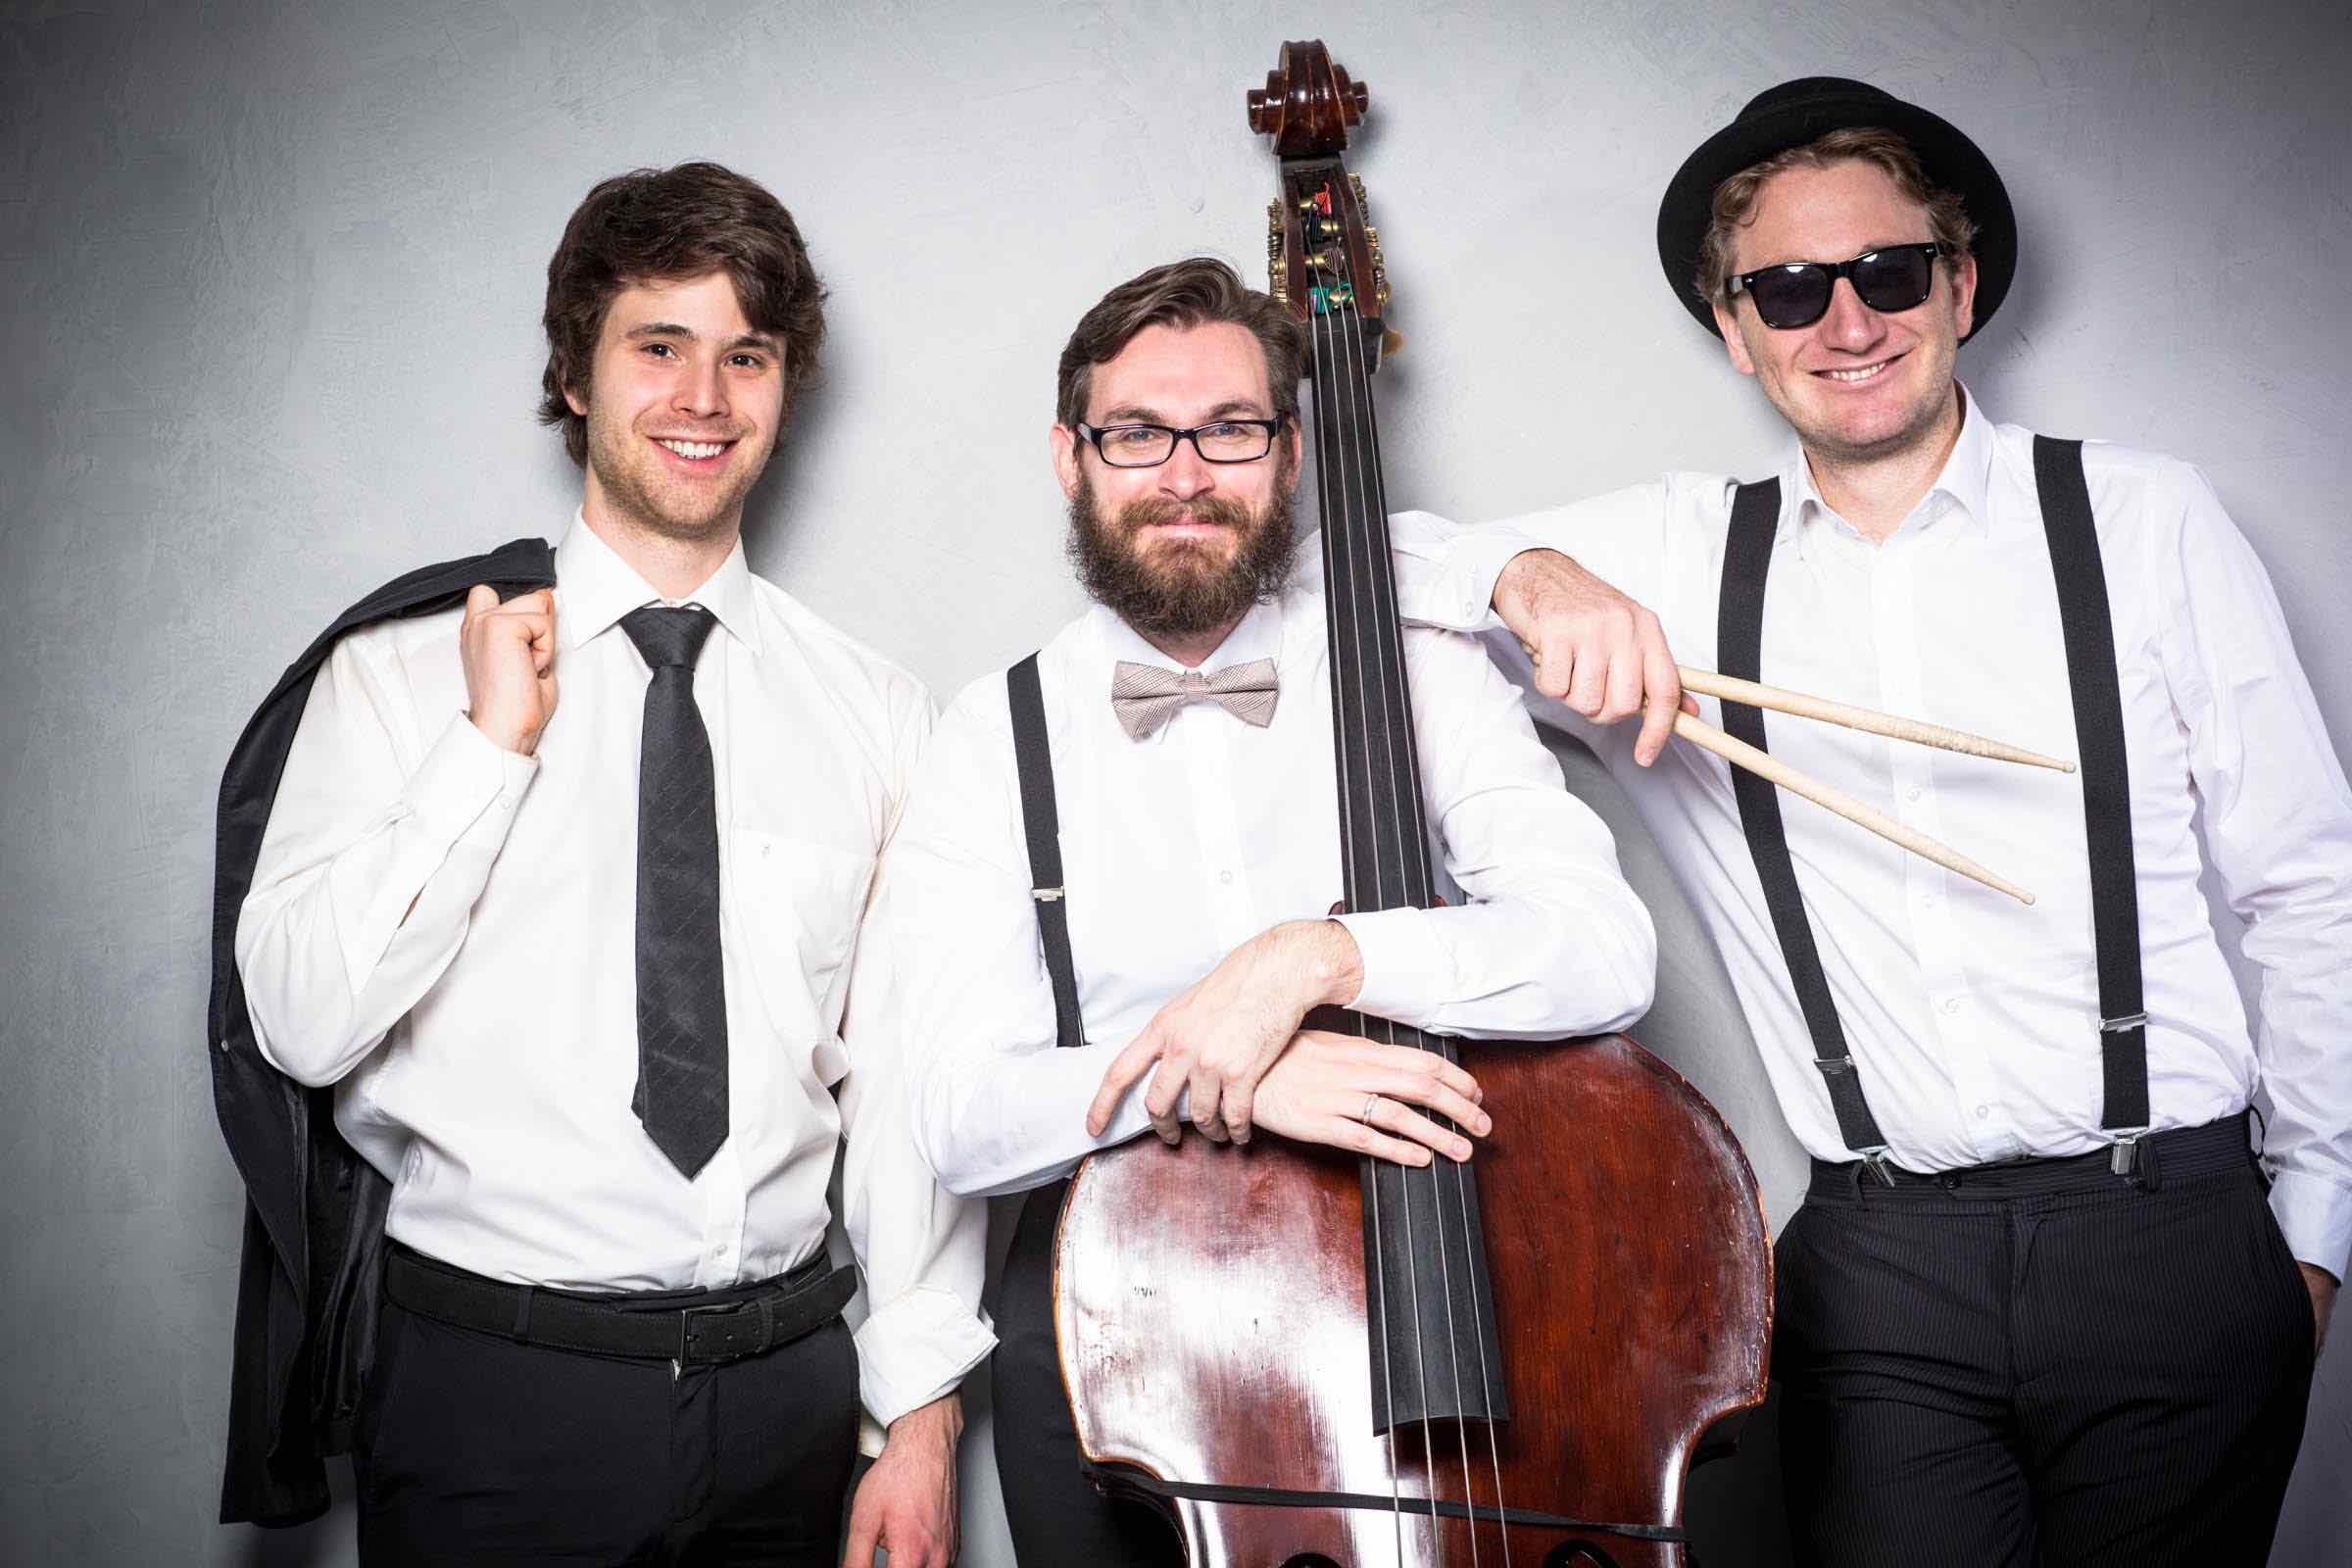 Jazzband | Hamburg | Livemusik | Partyband | Liveband | Popband | Swingband | Duo | Trio | Soul | Motown | Swing | Popband | Kontrabass | Kontrabass | Pianist | Bass | Hochzeit | Messe | Firmenfeier | Gala | Charity | Dinner | Hamburgfeiert